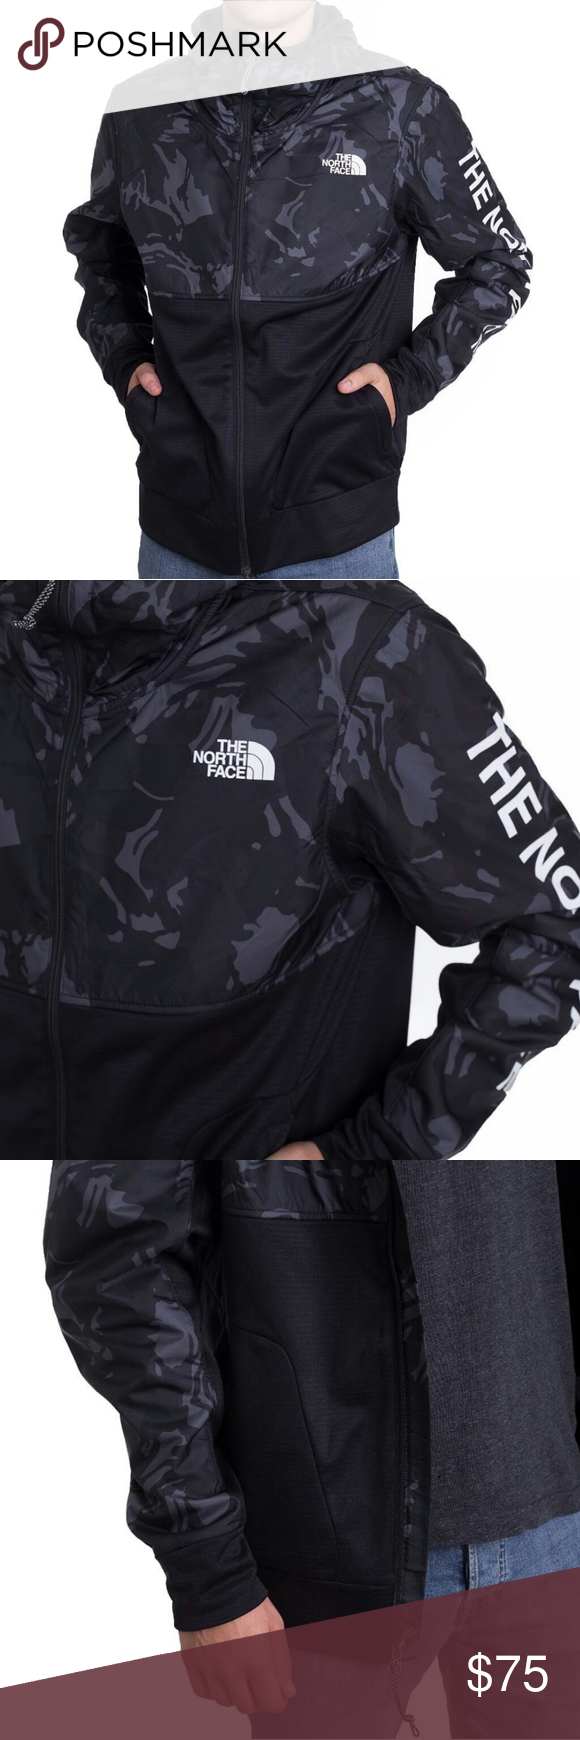 Men The North Face Tnl Ovly Jacket Black Jackets The North Face Black North Face [ 1740 x 580 Pixel ]